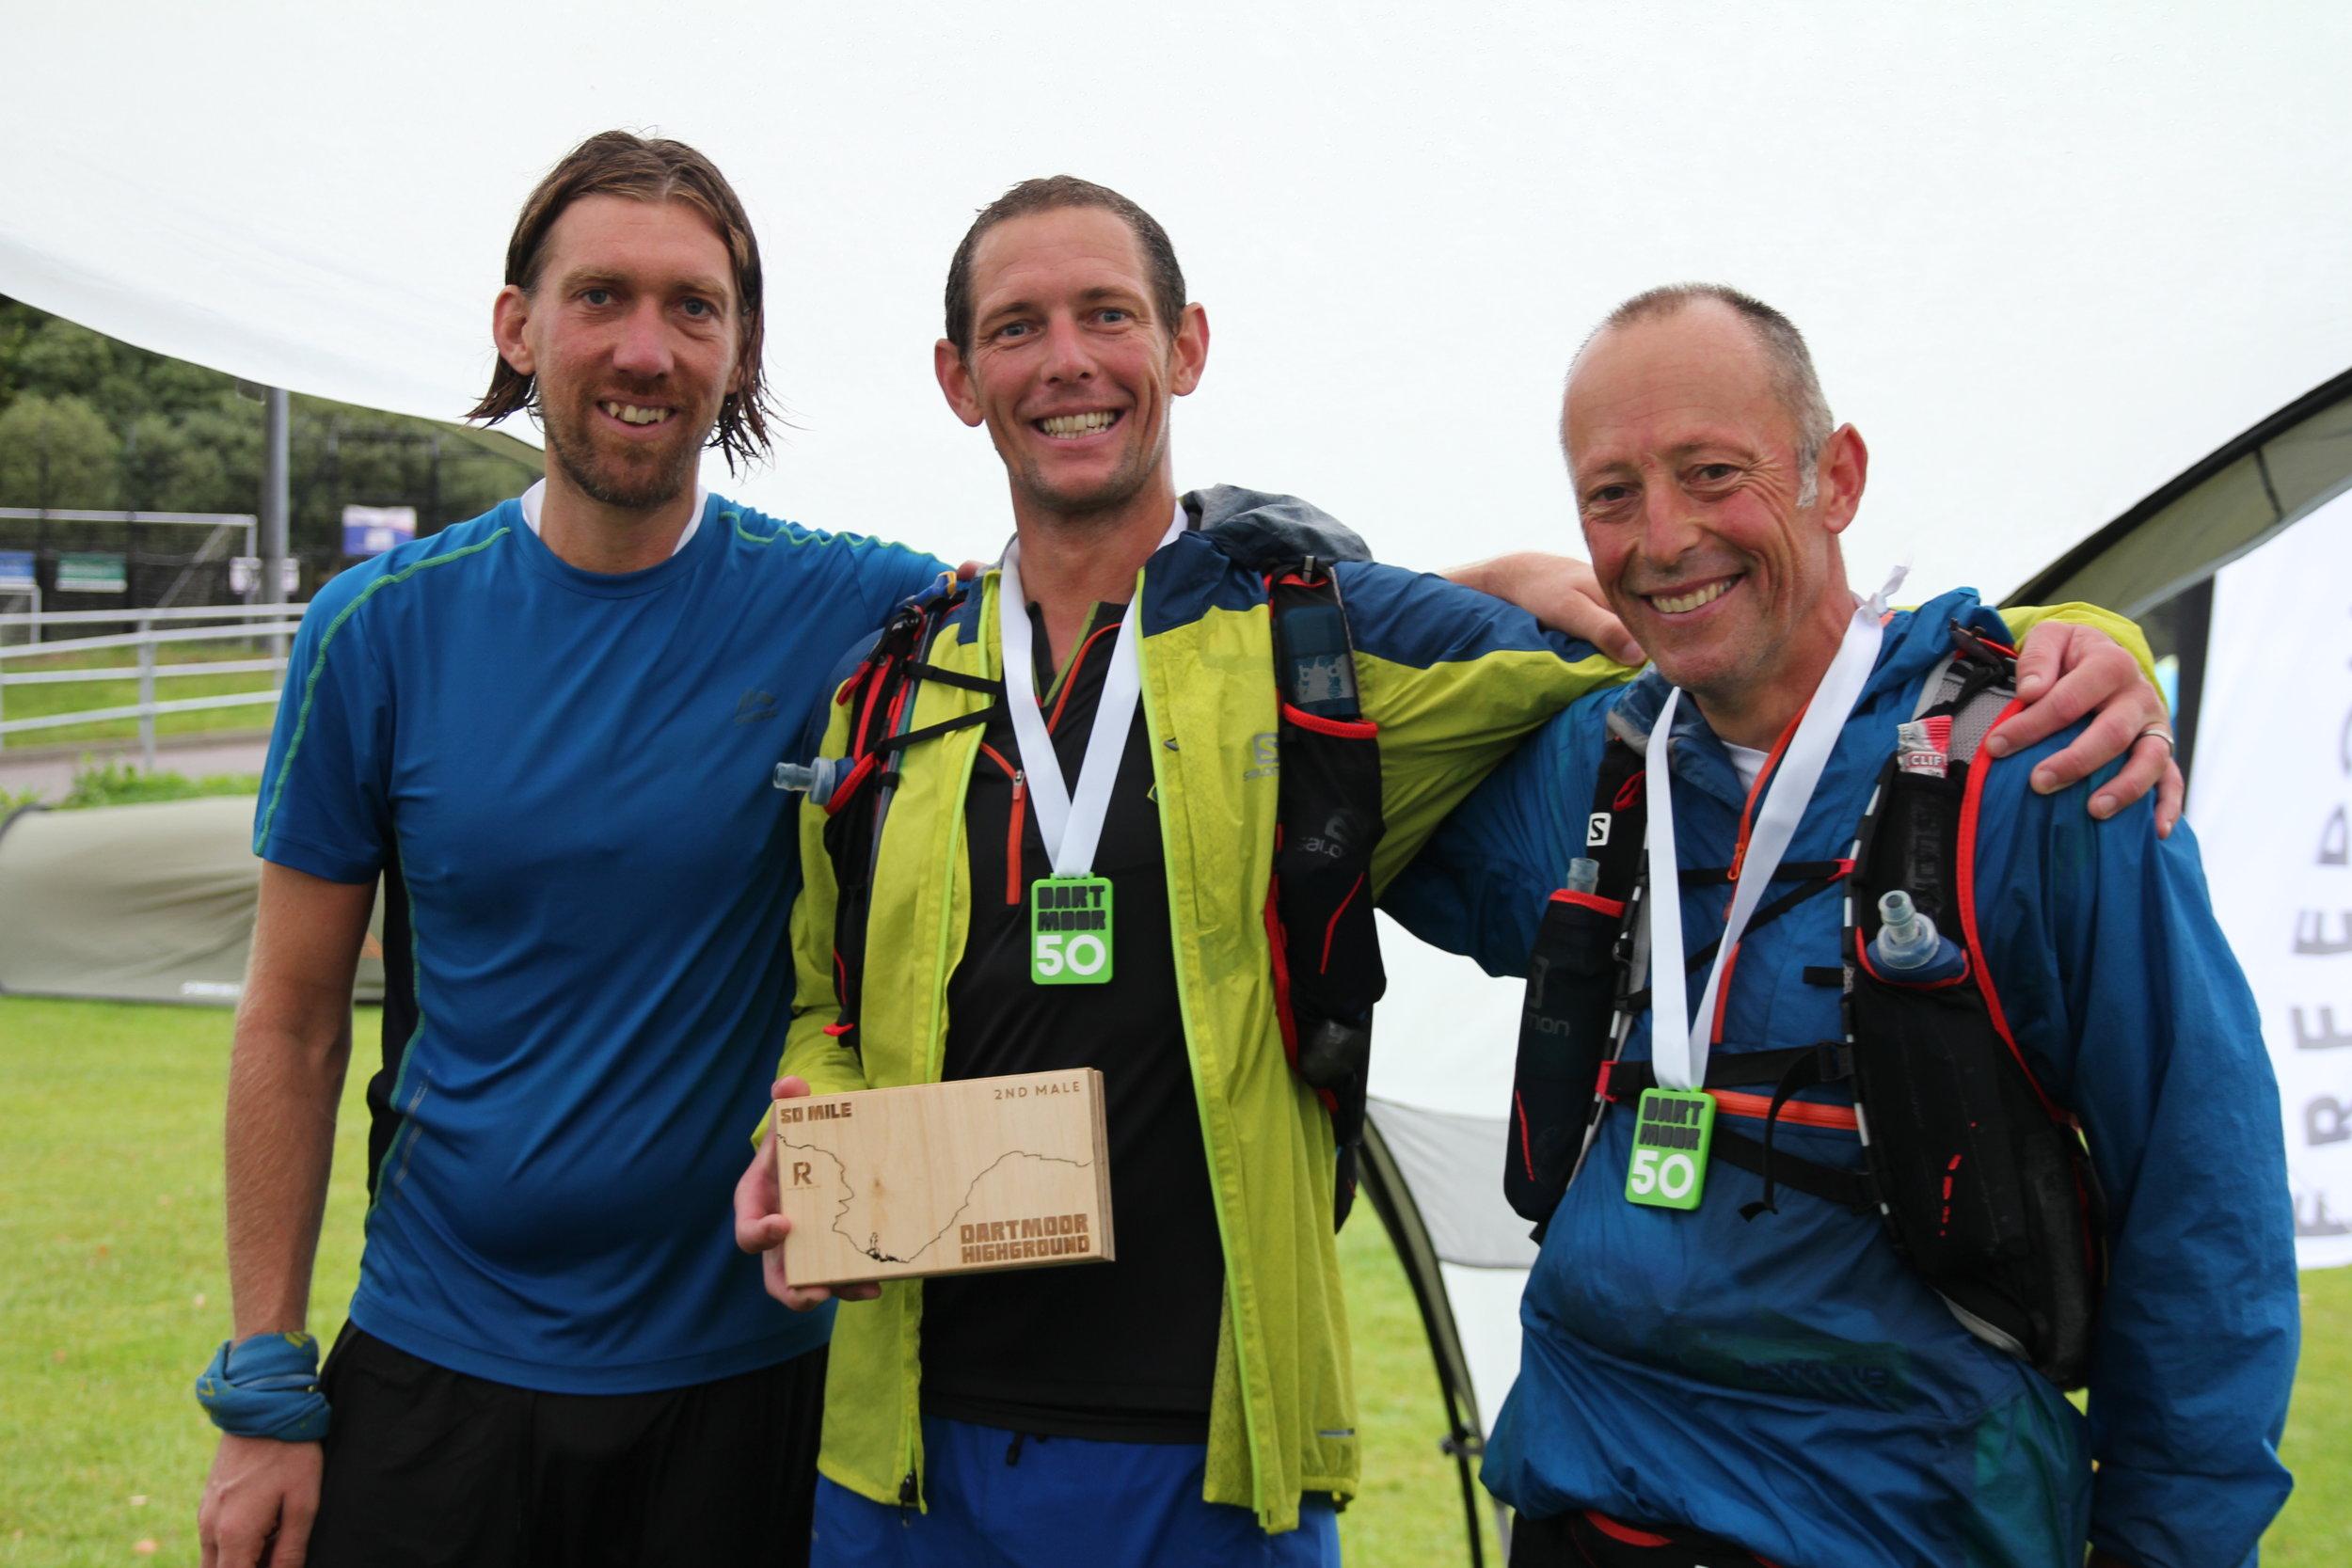 3 friends running on Dartmoor